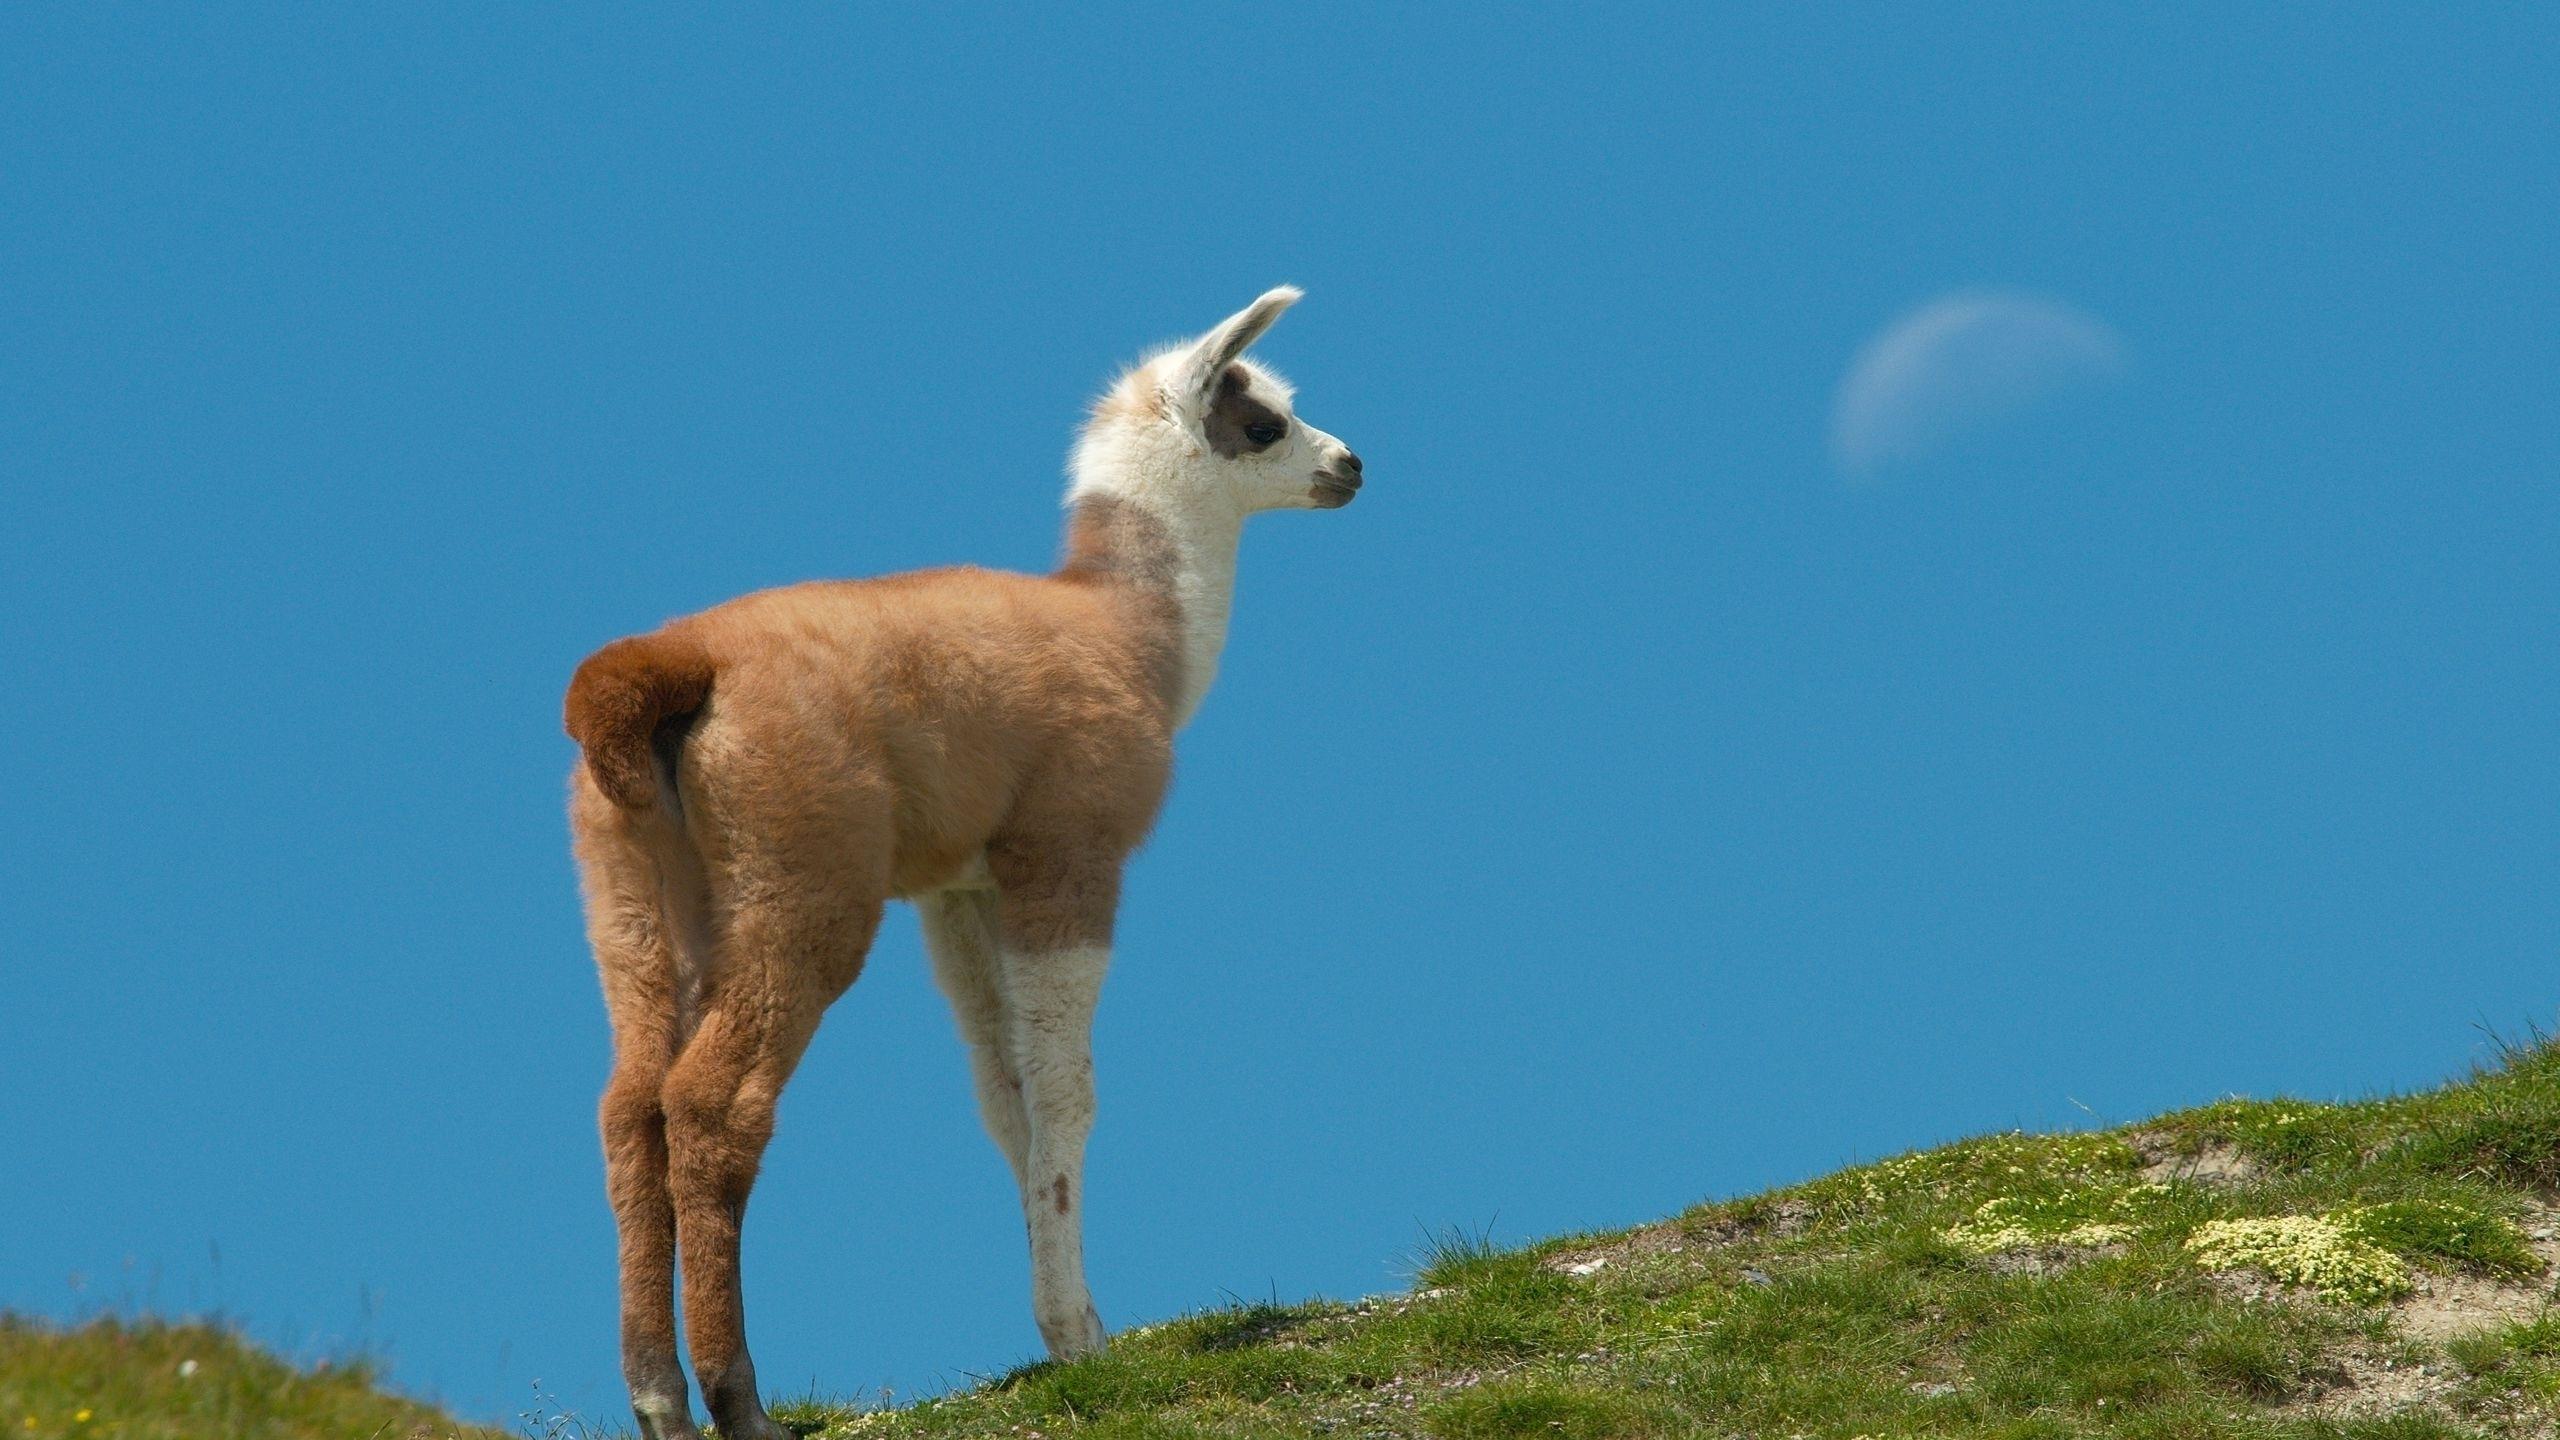 Llama wallpaper 31125 2560x1440